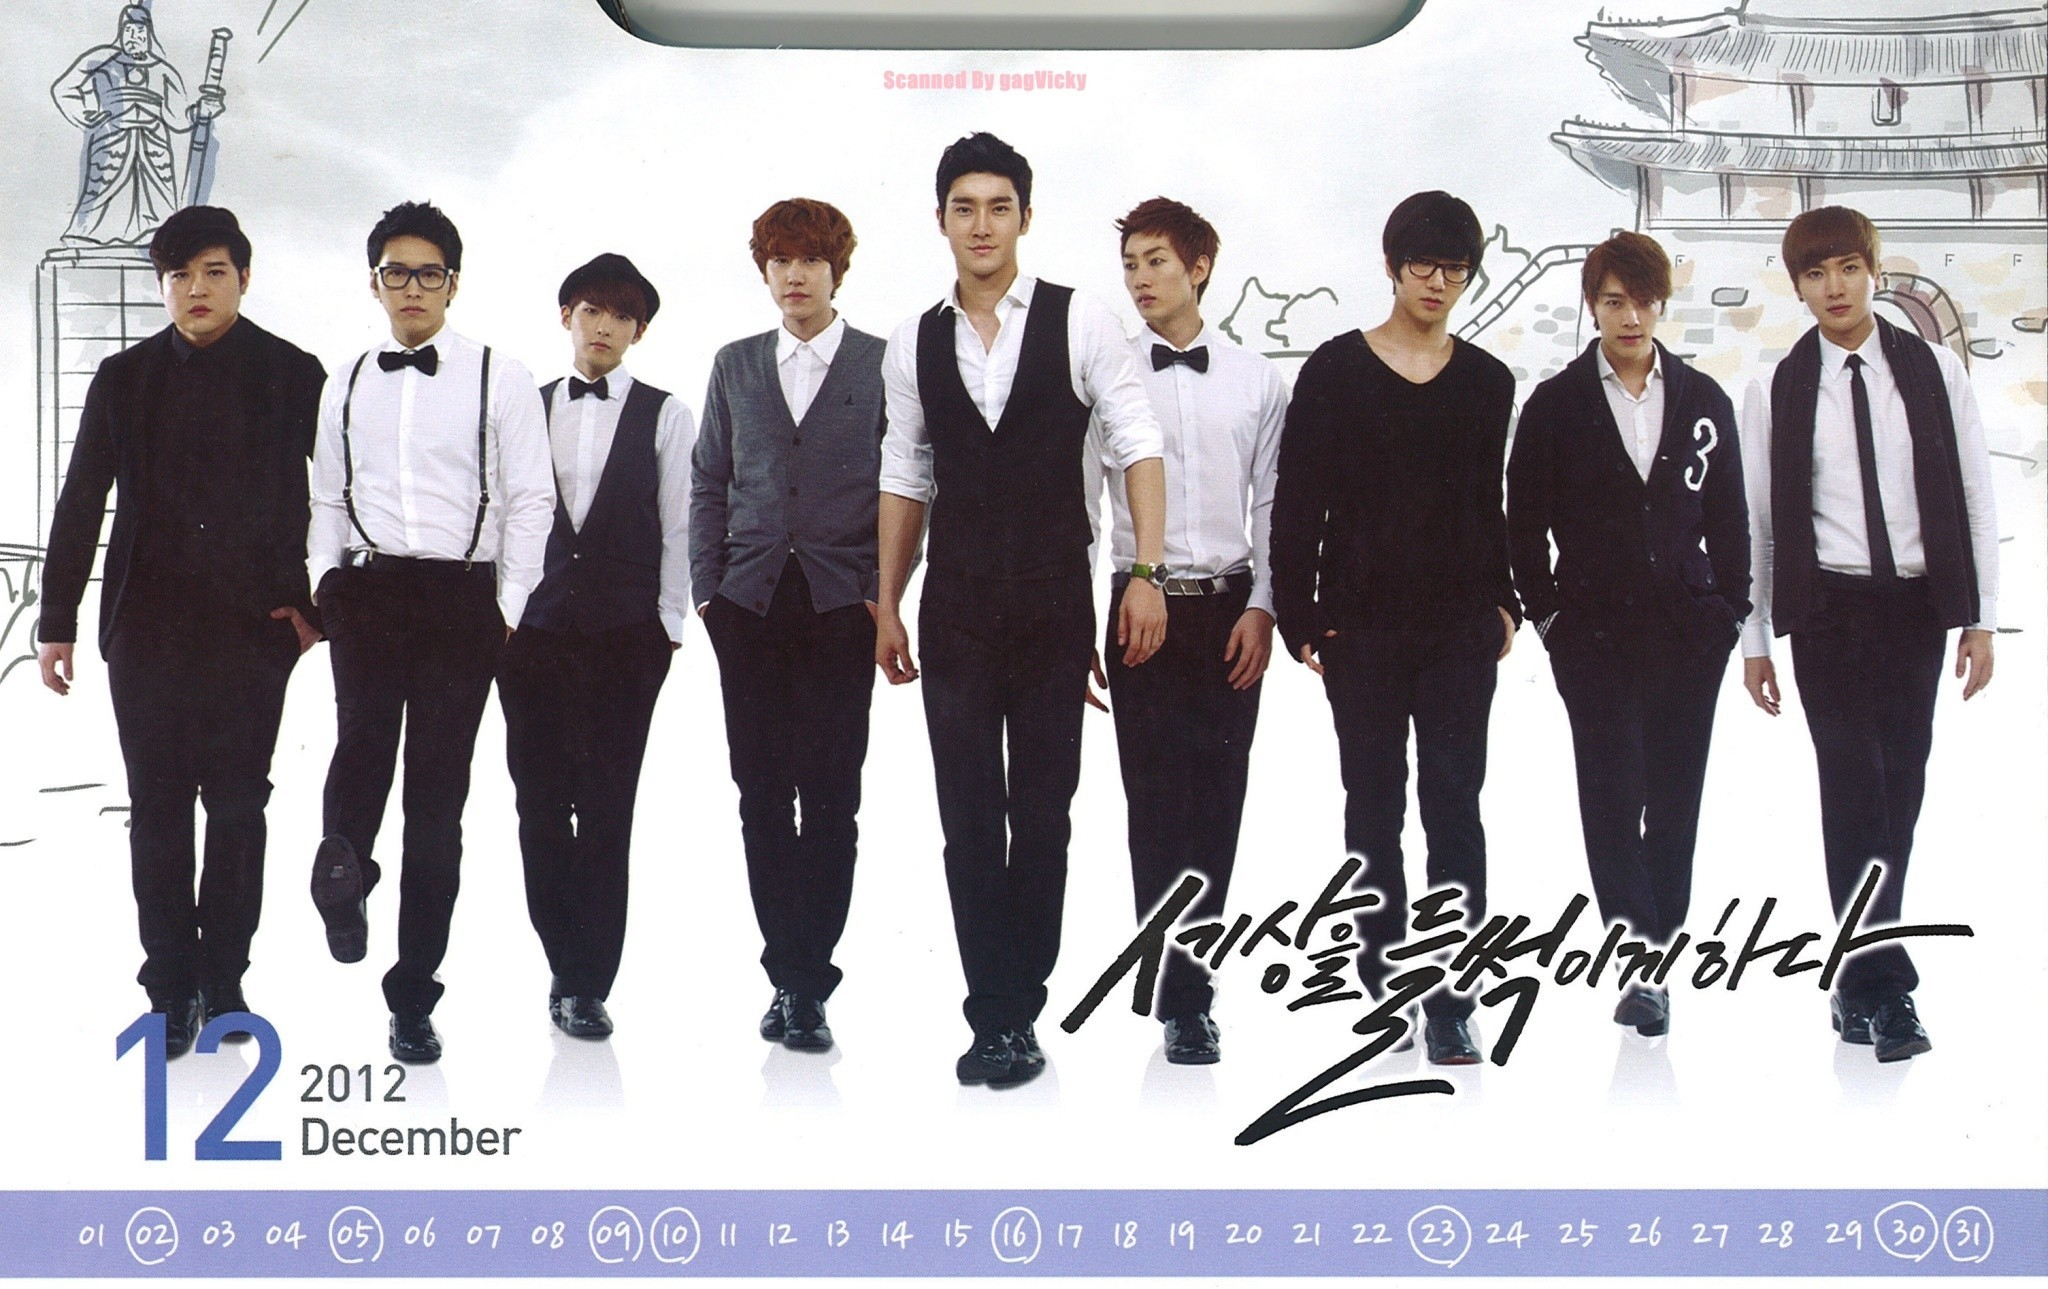 Super Junior Wallpapers 76Yjkl